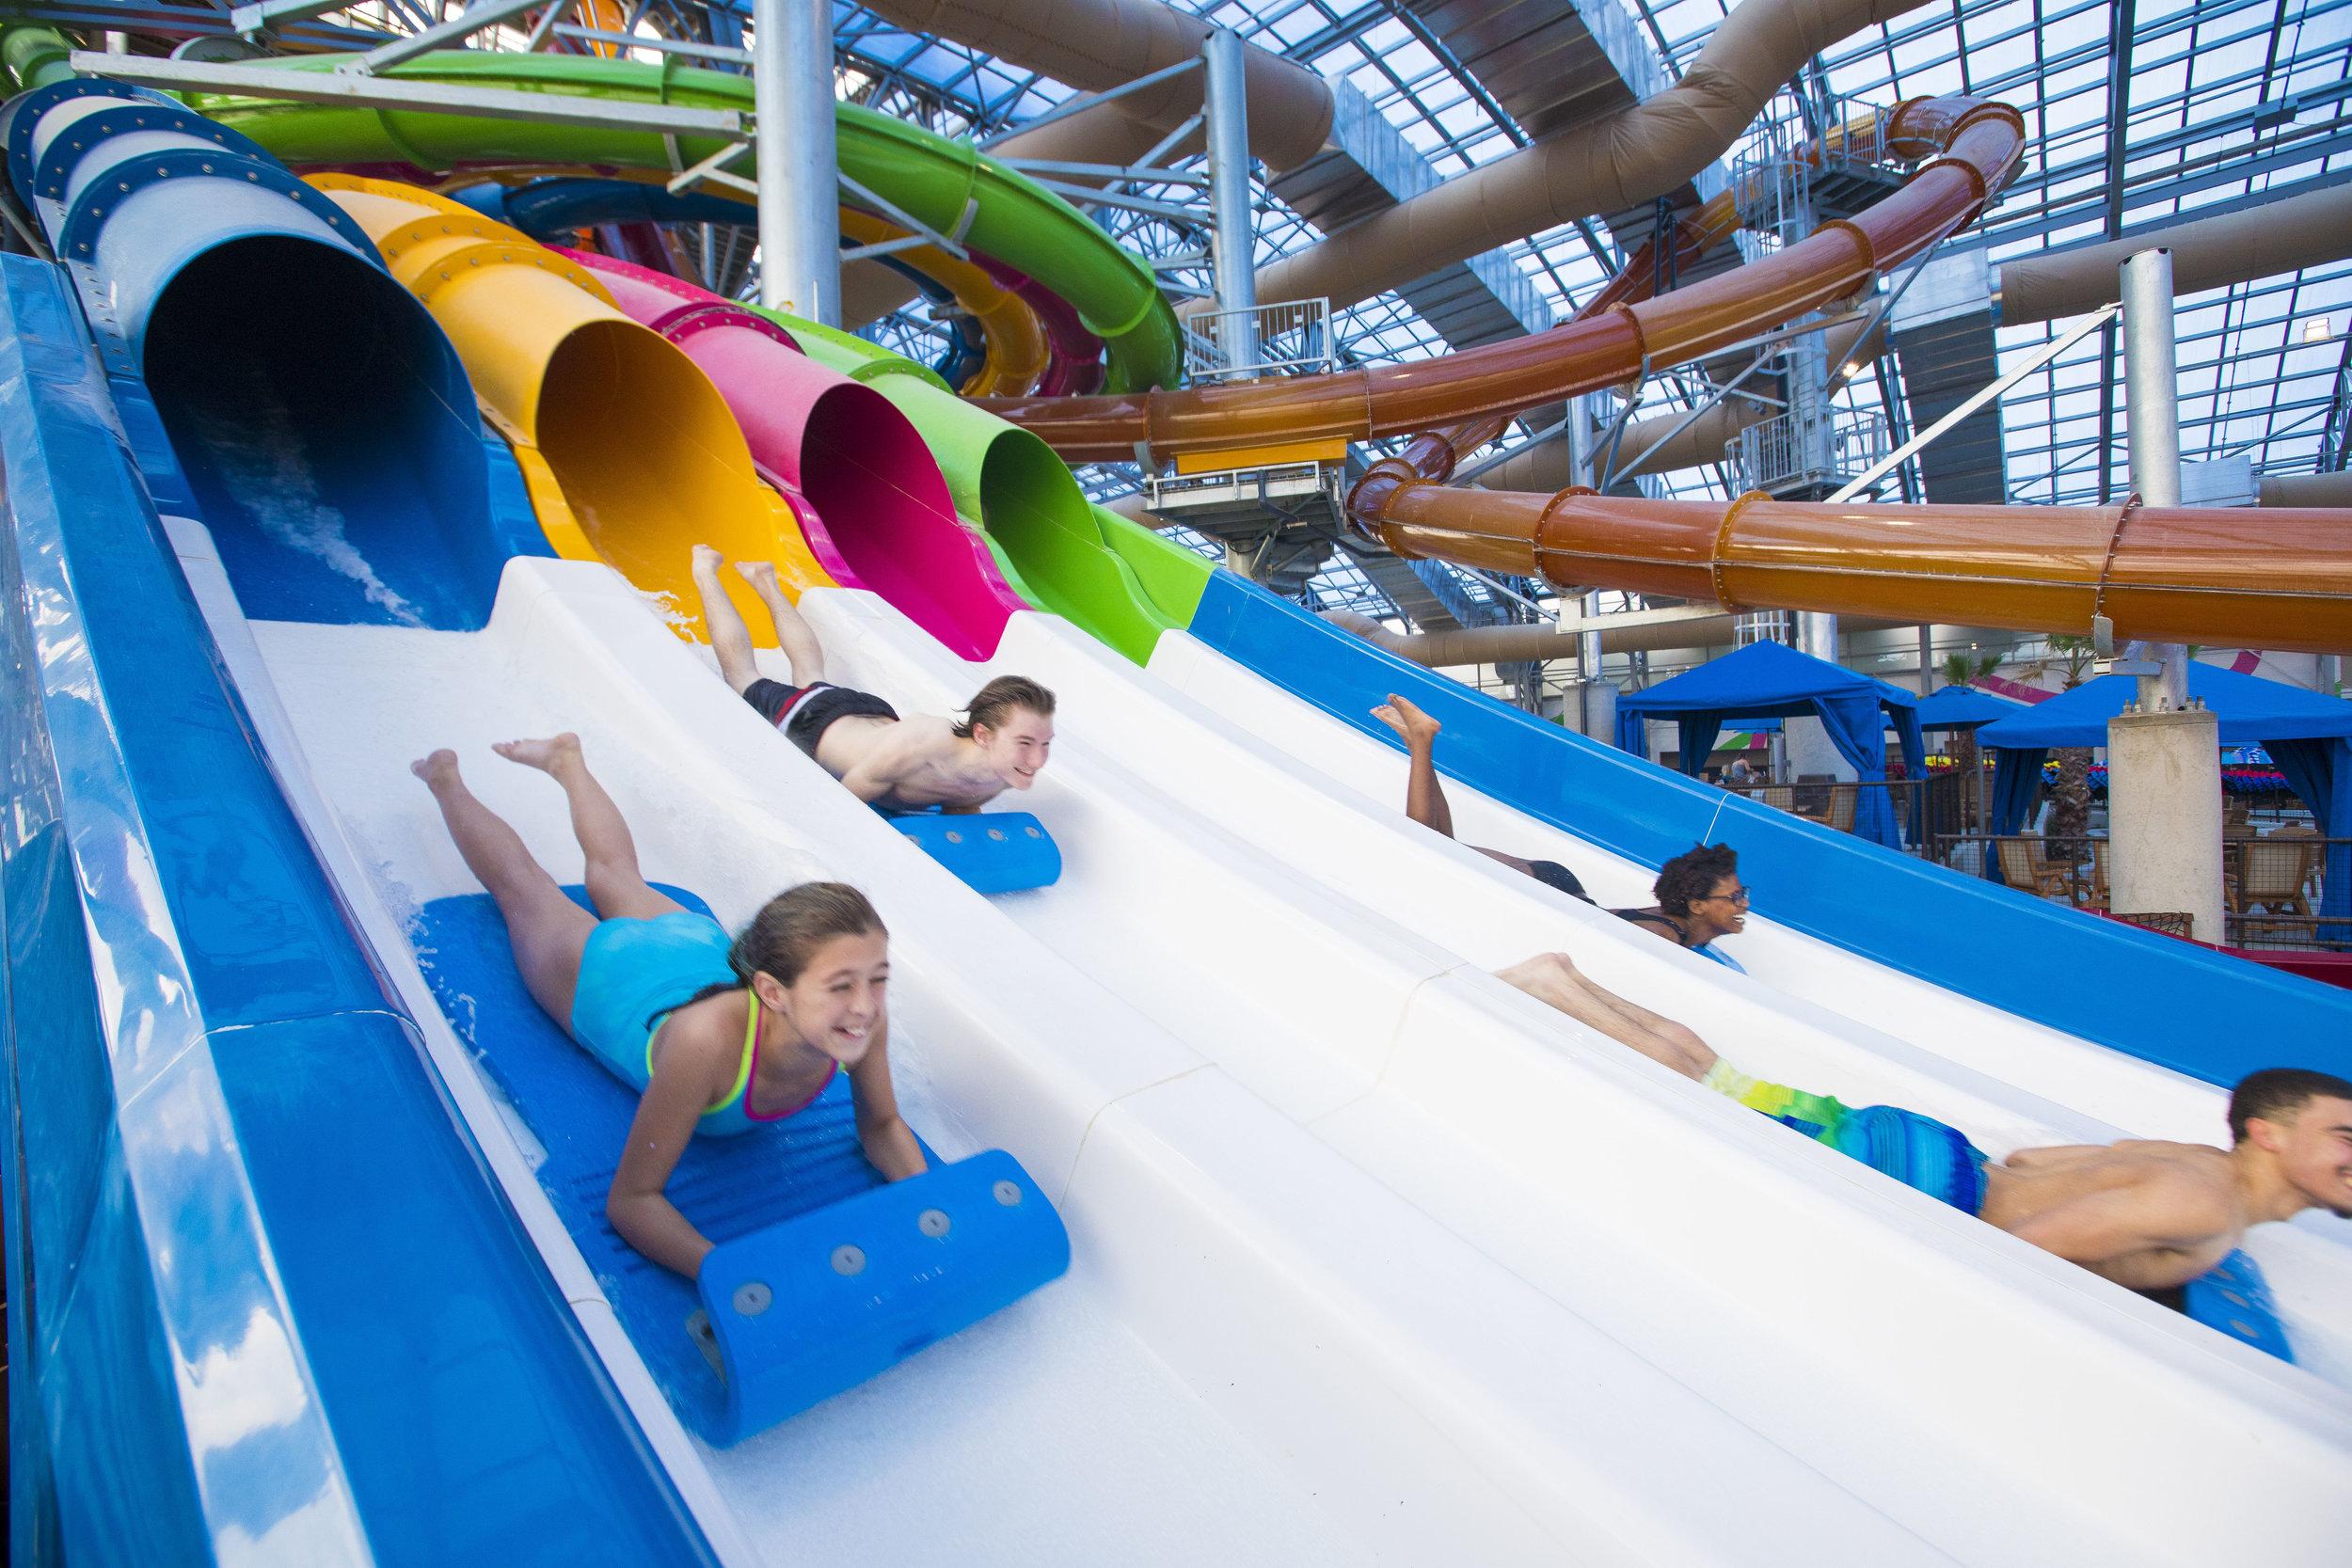 Kids racing down the mat racing slides